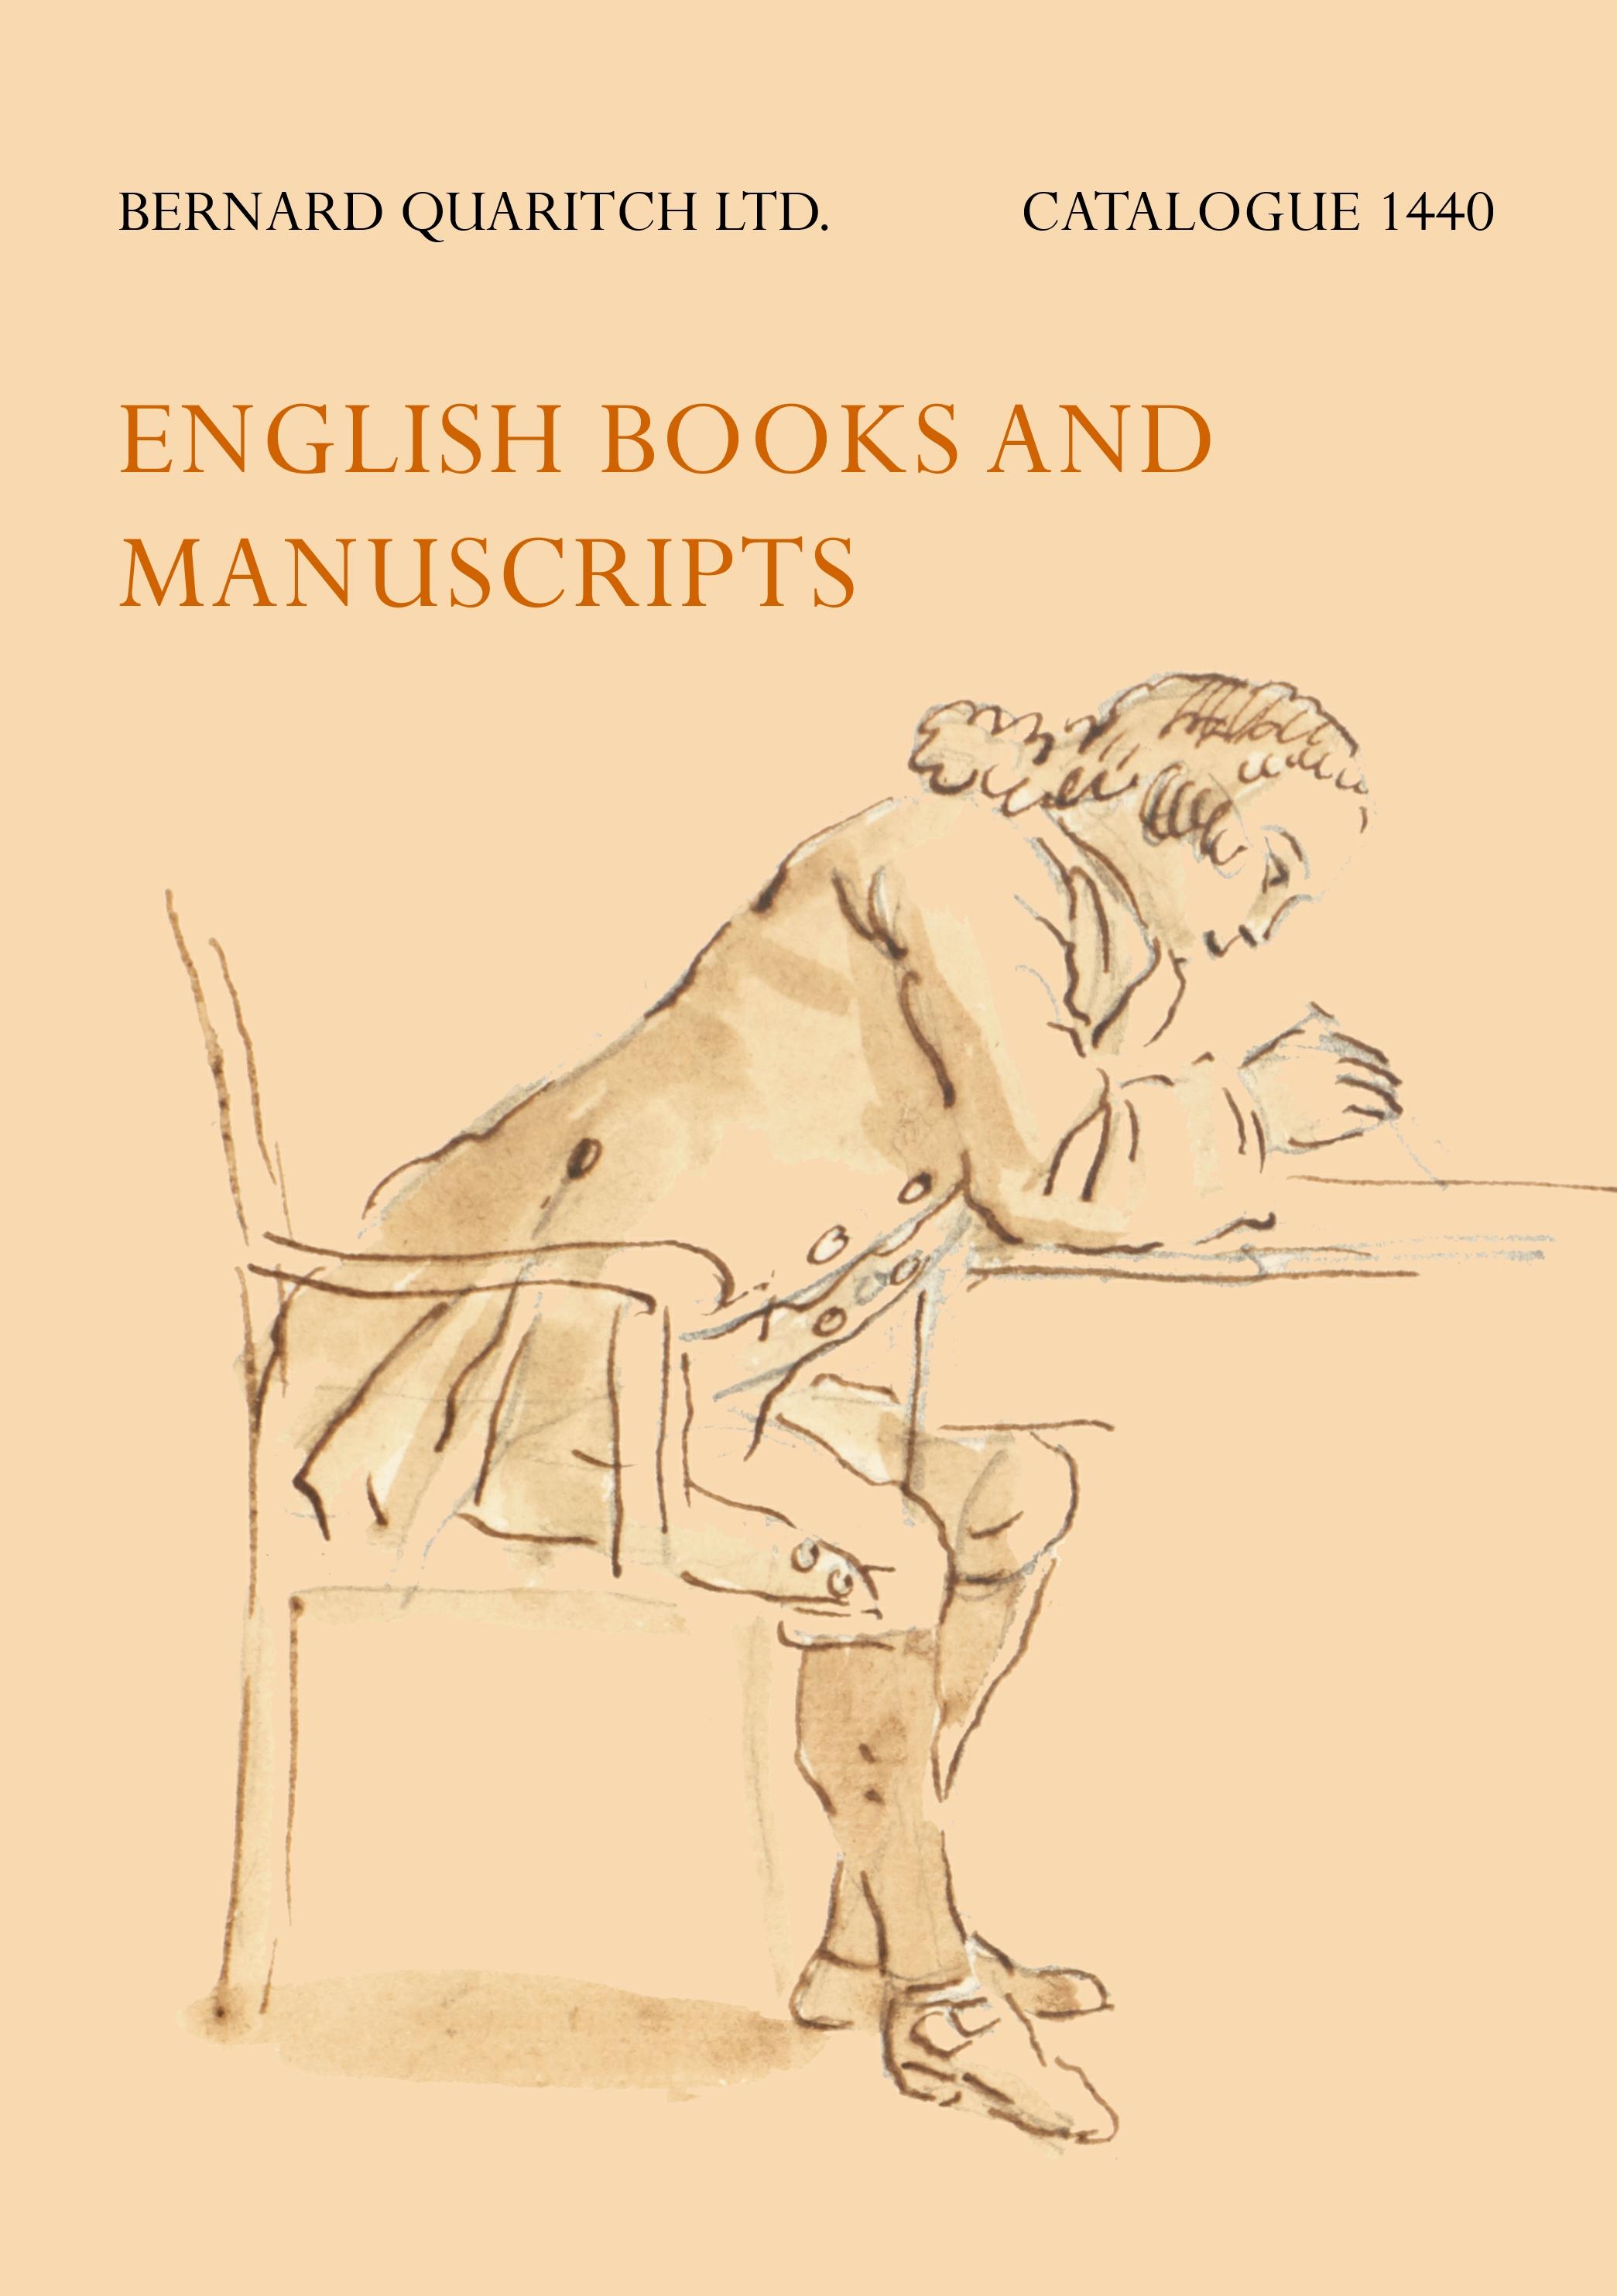 1440 - English Books and Manuscripts